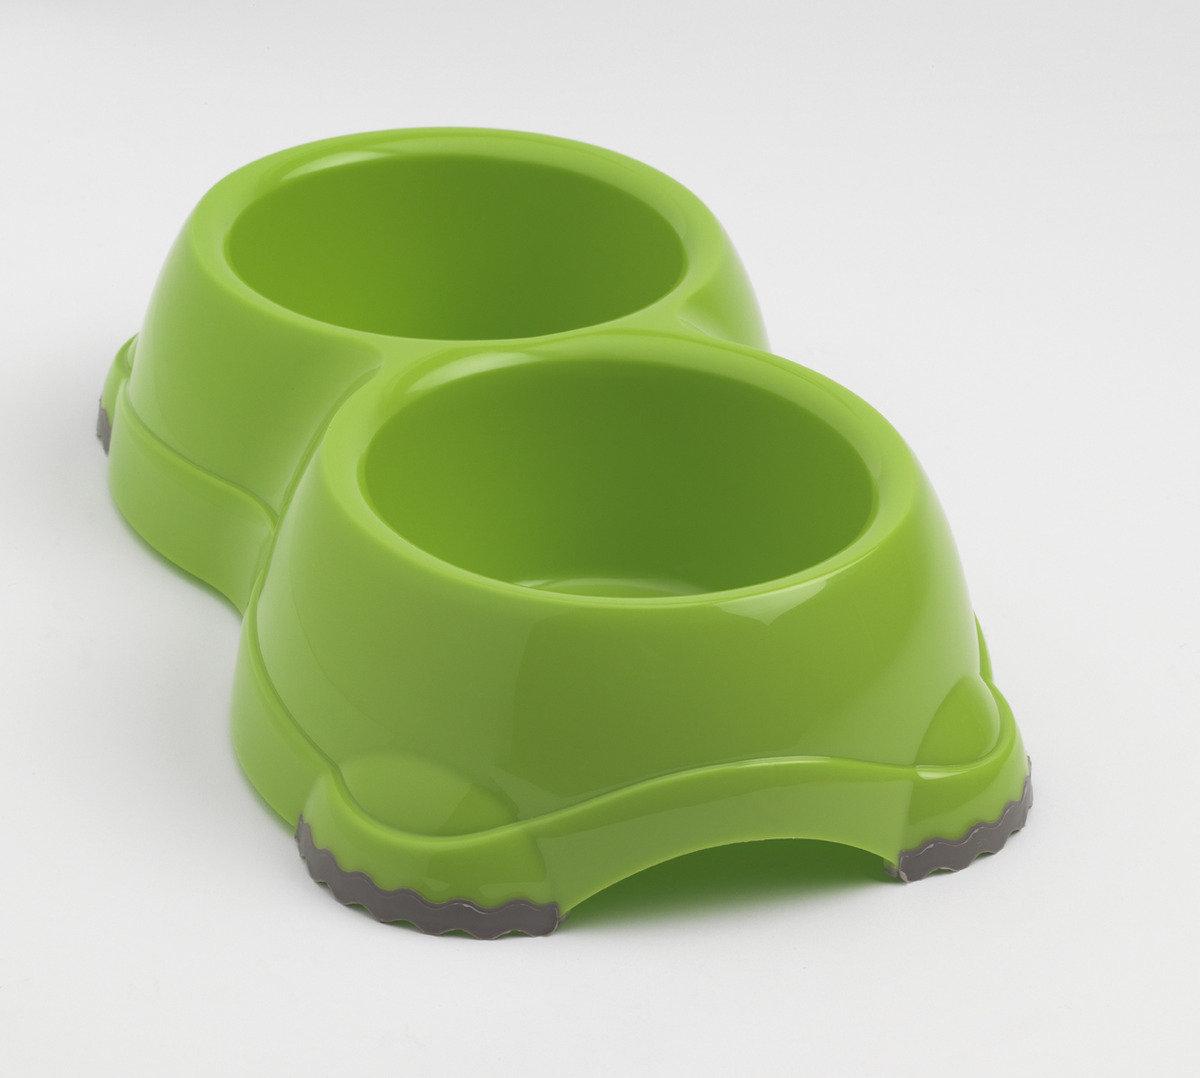 MPH106-08 Double Smarty Bowl 寵物碗 H106 - 蘋果綠色